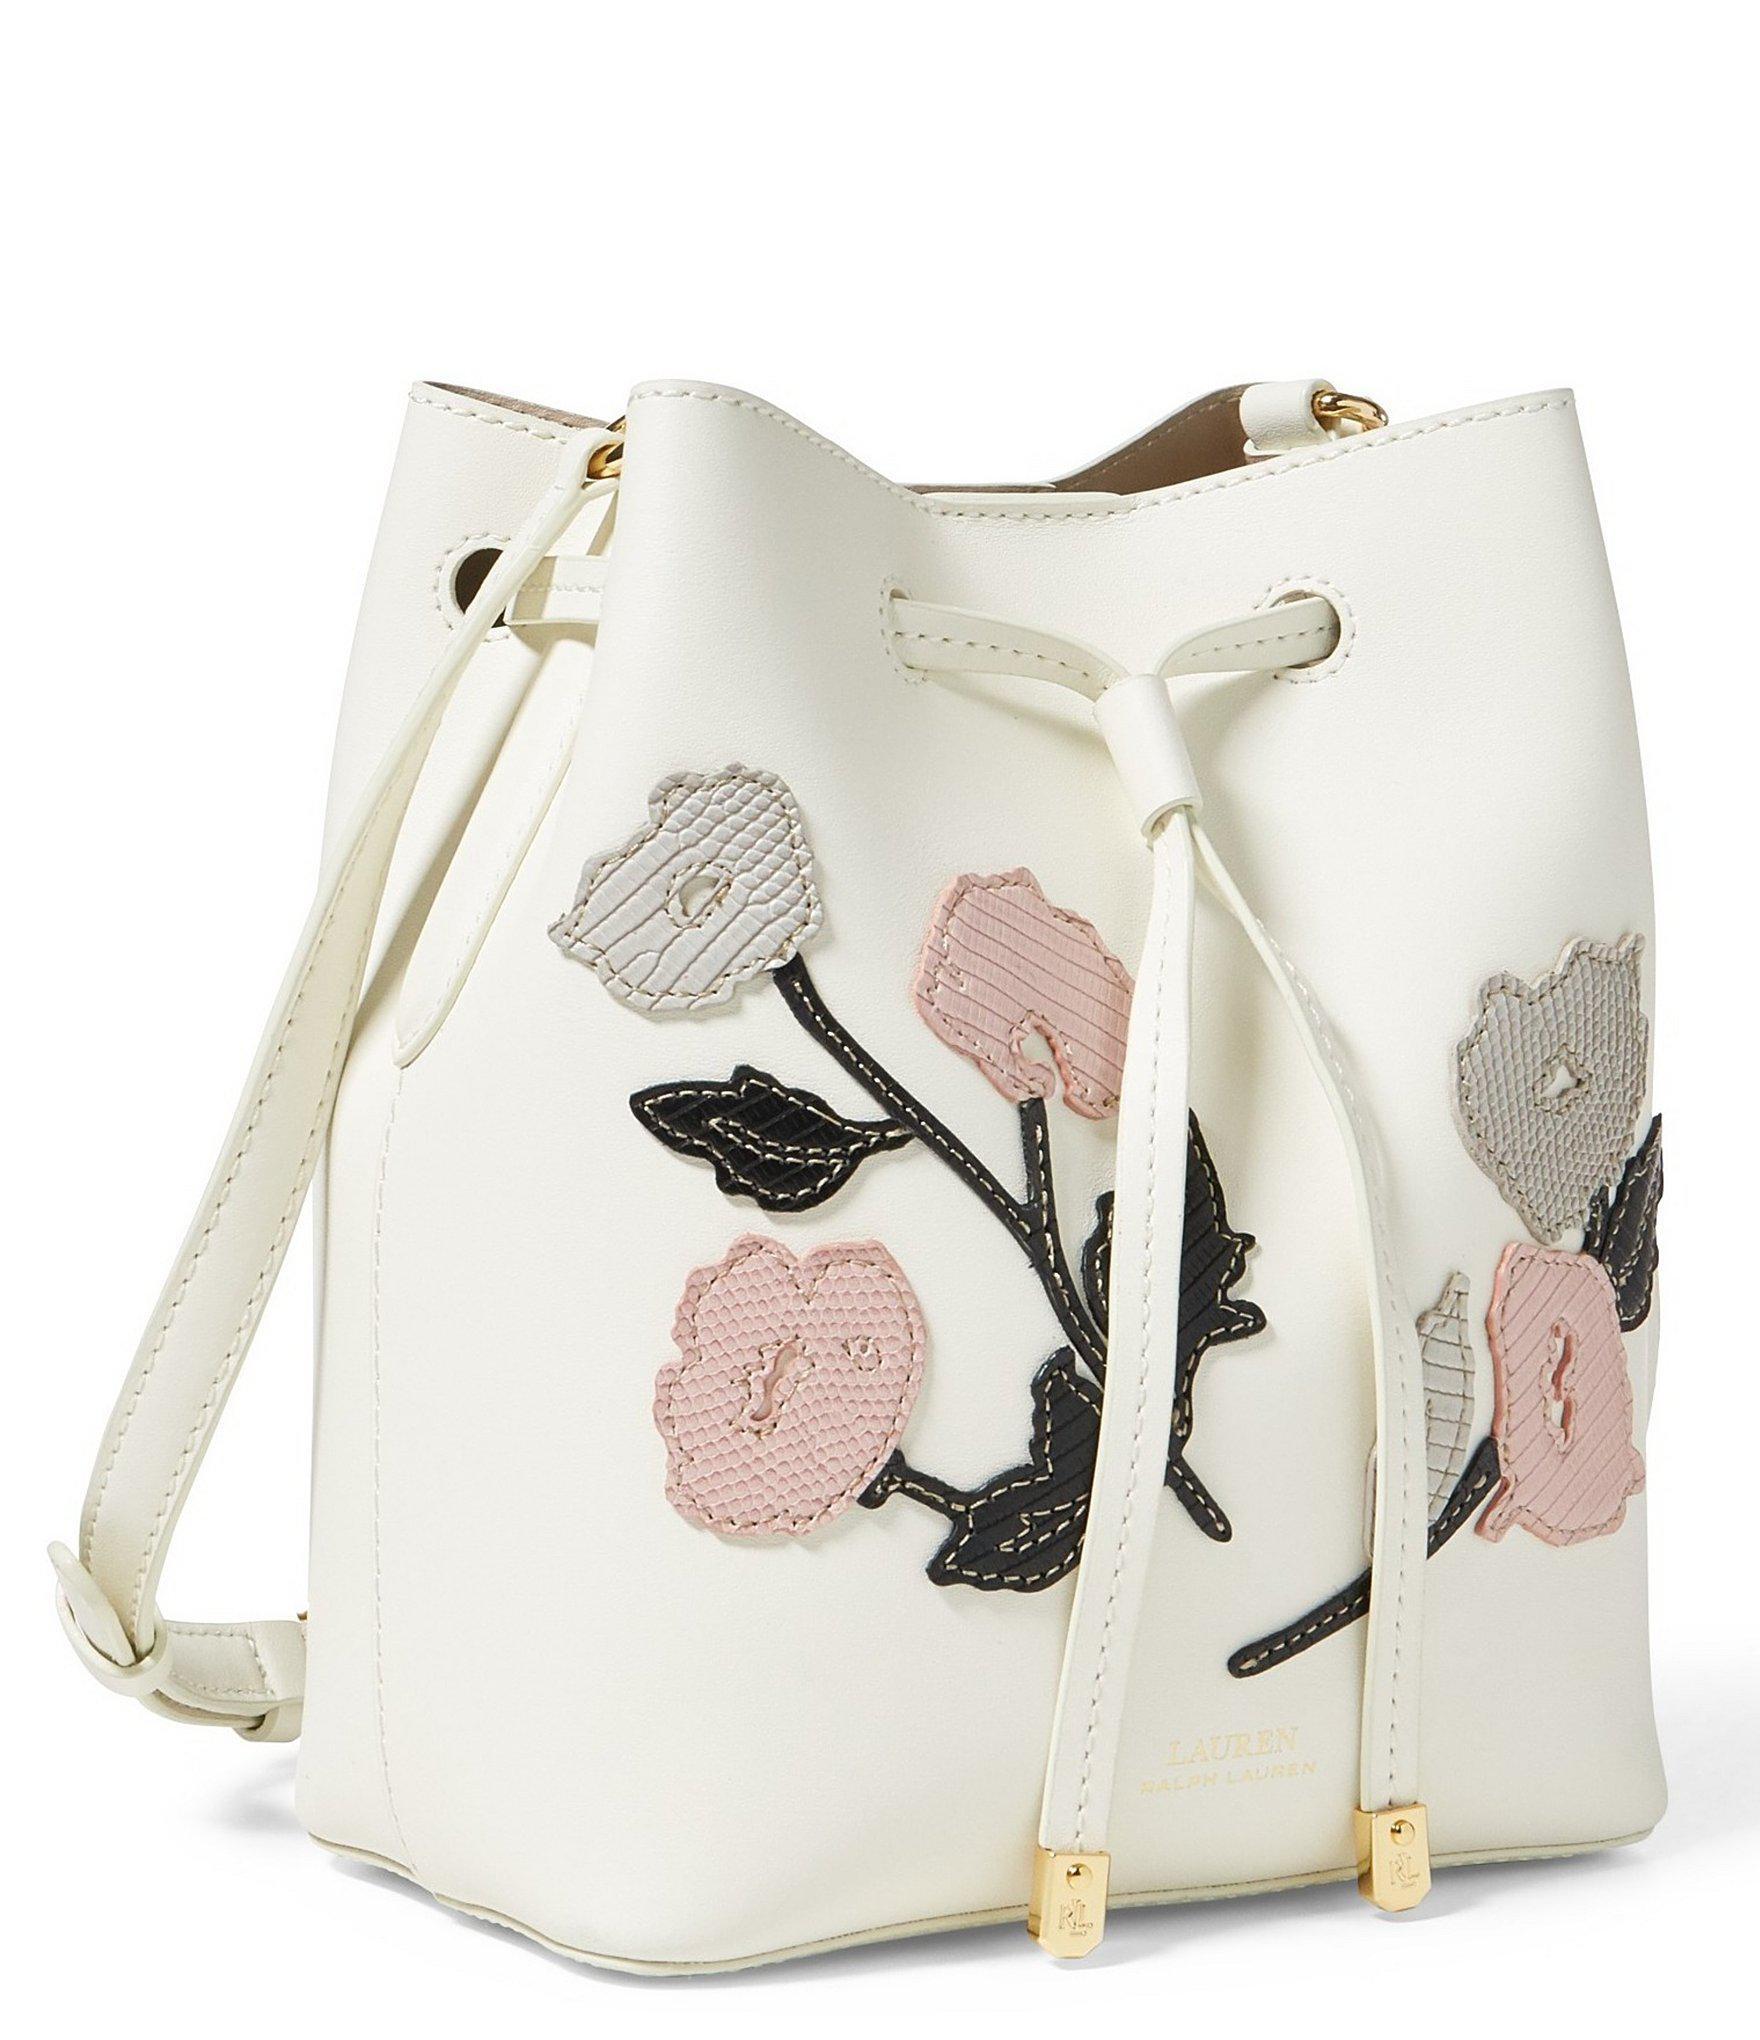 a911e0c41e Lyst - Lauren by Ralph Lauren Mini Debby Ii Floral Drawstring Bag